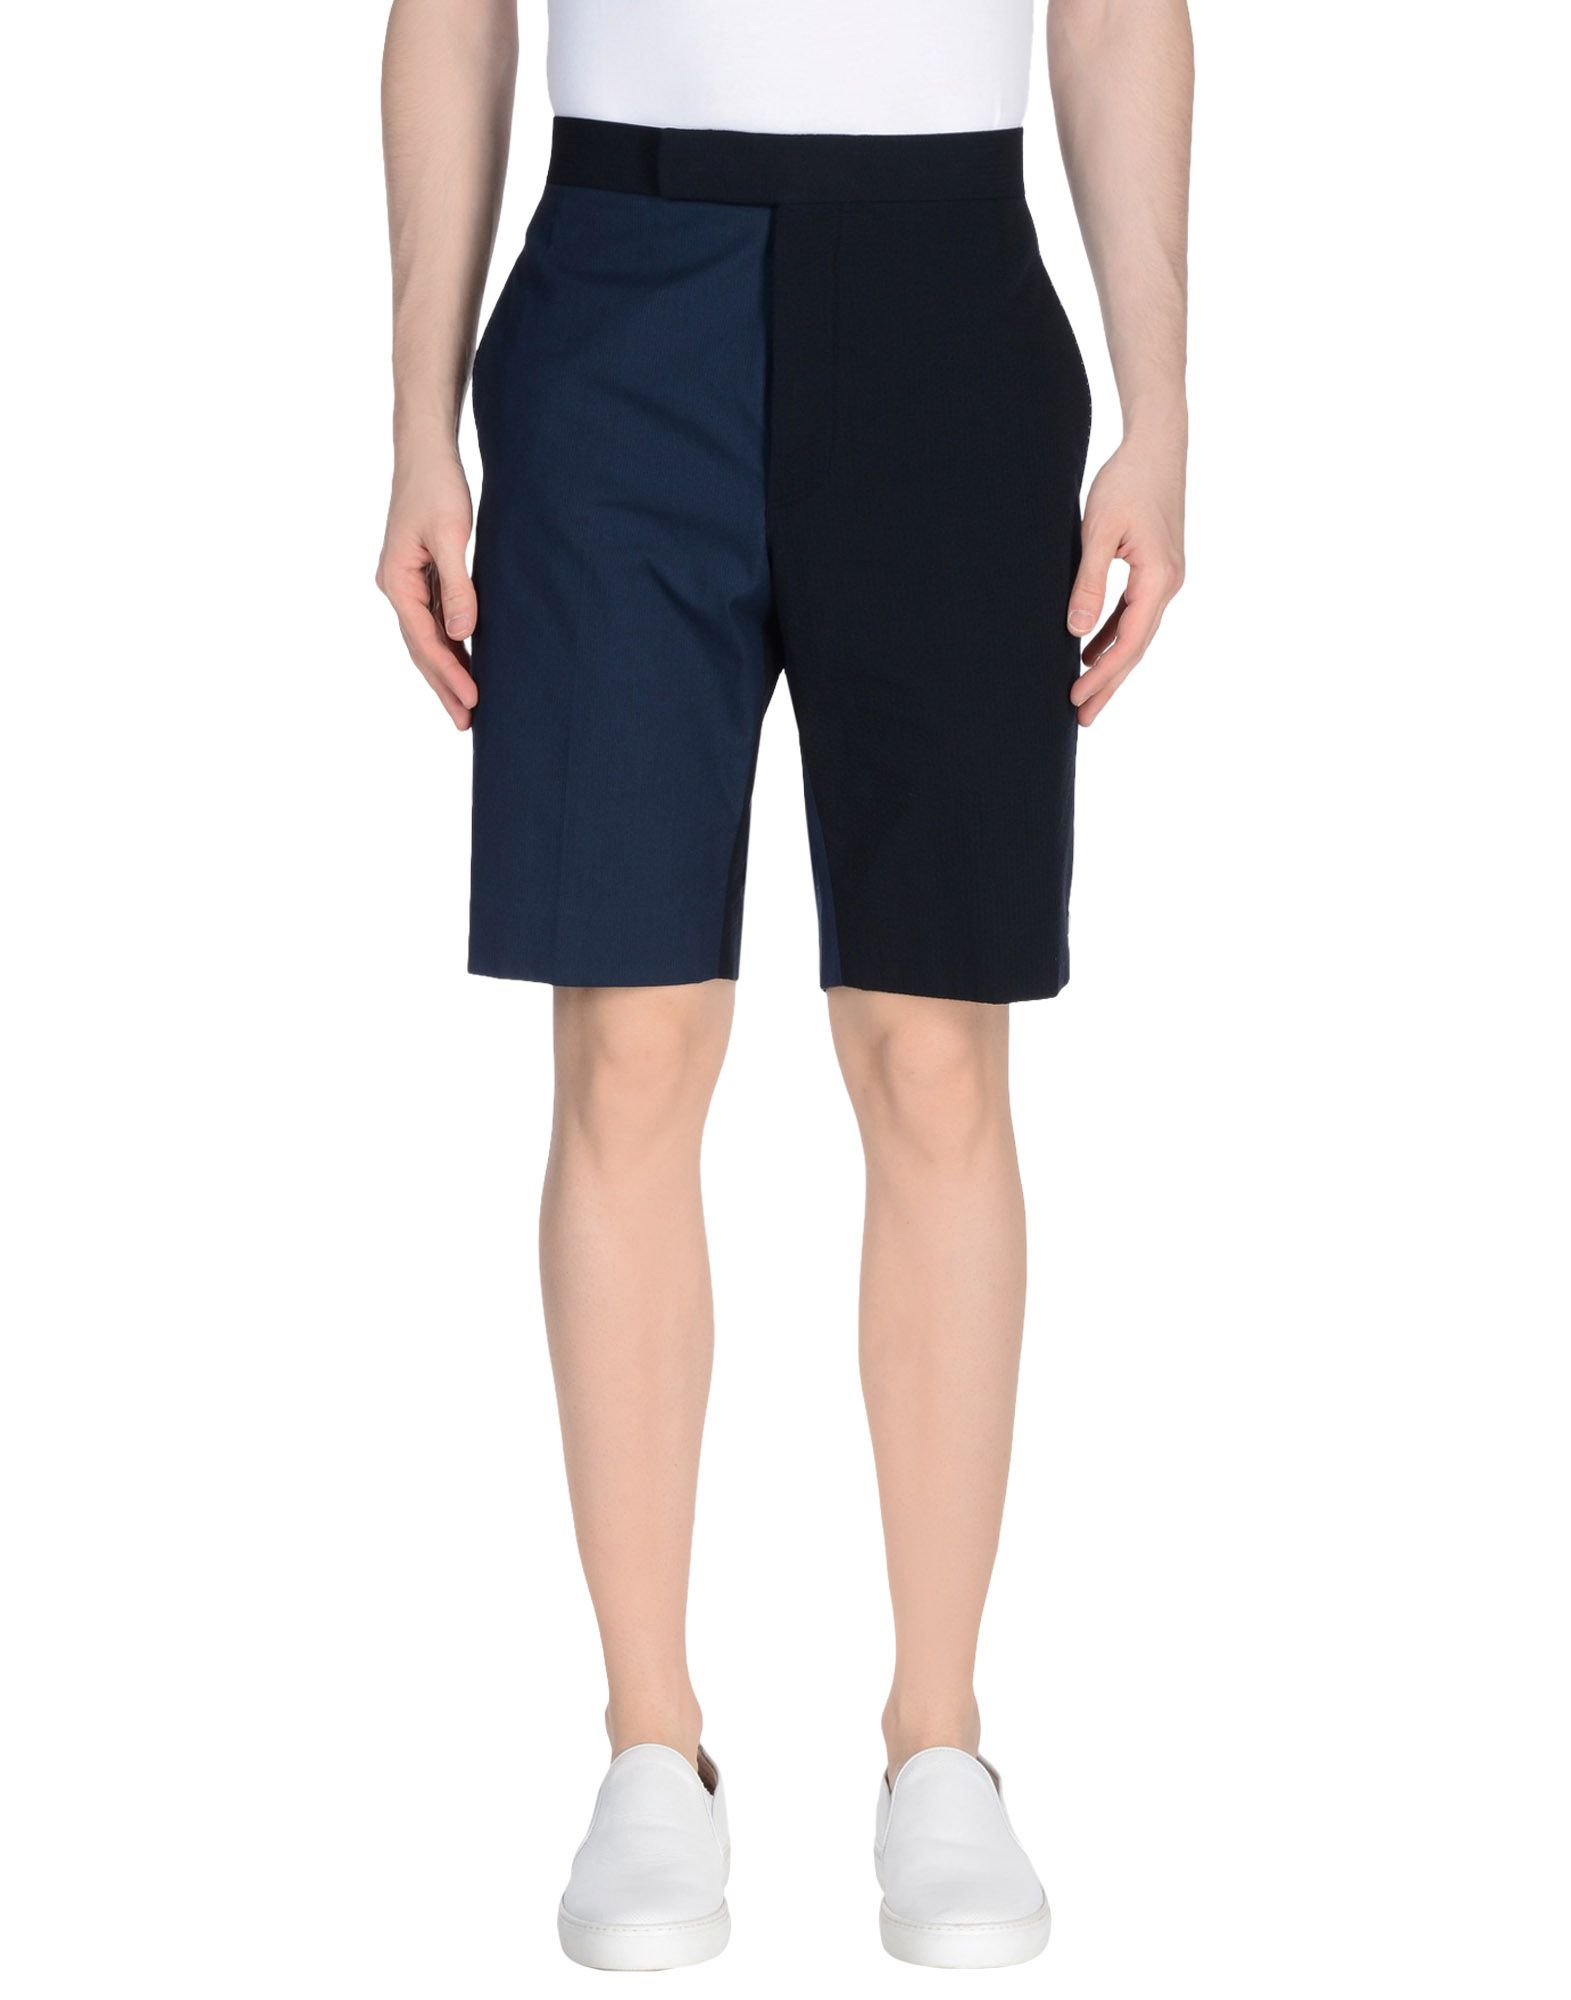 Pantalone Classico Thom Browne Uomo - Acquista online su